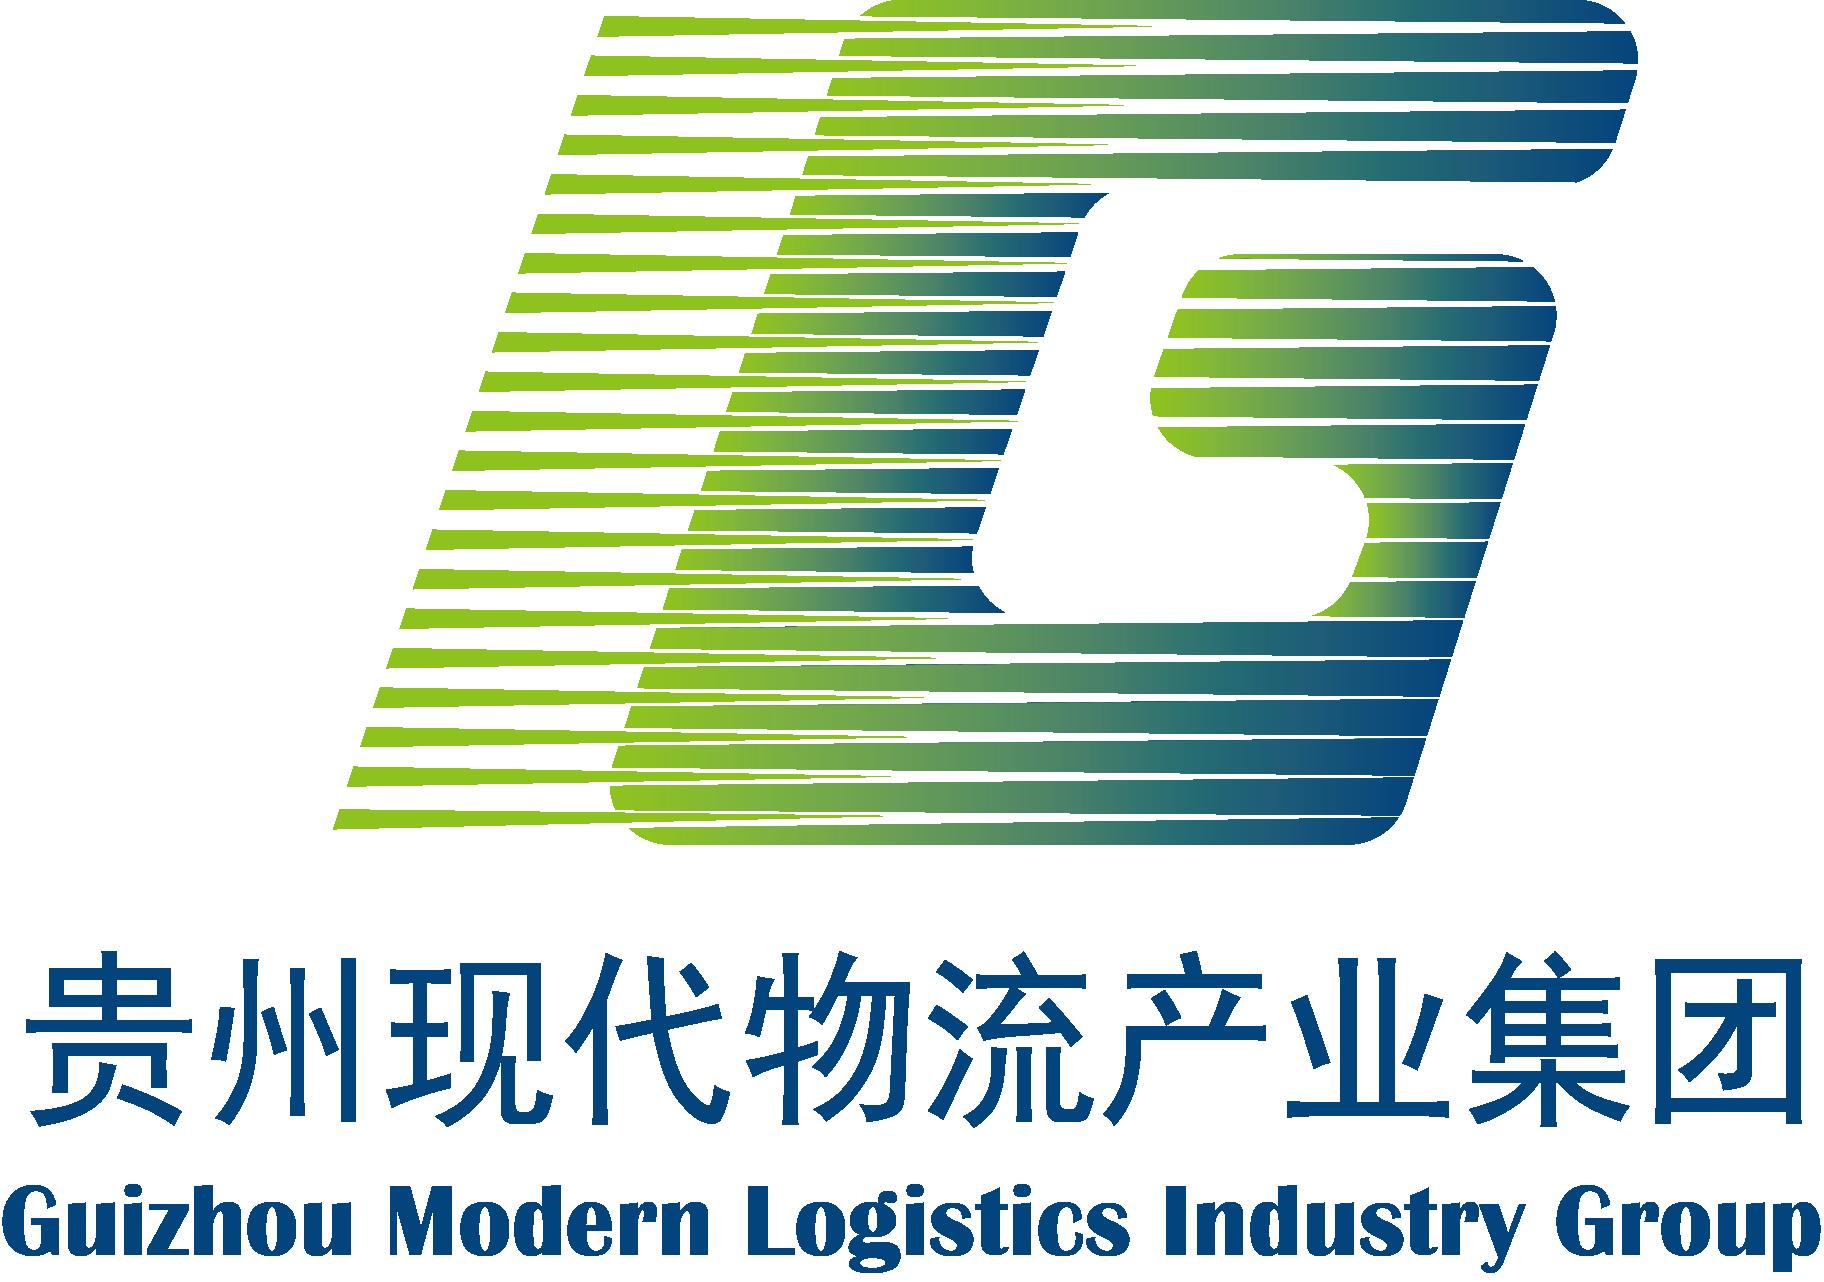 logo竖版透明底